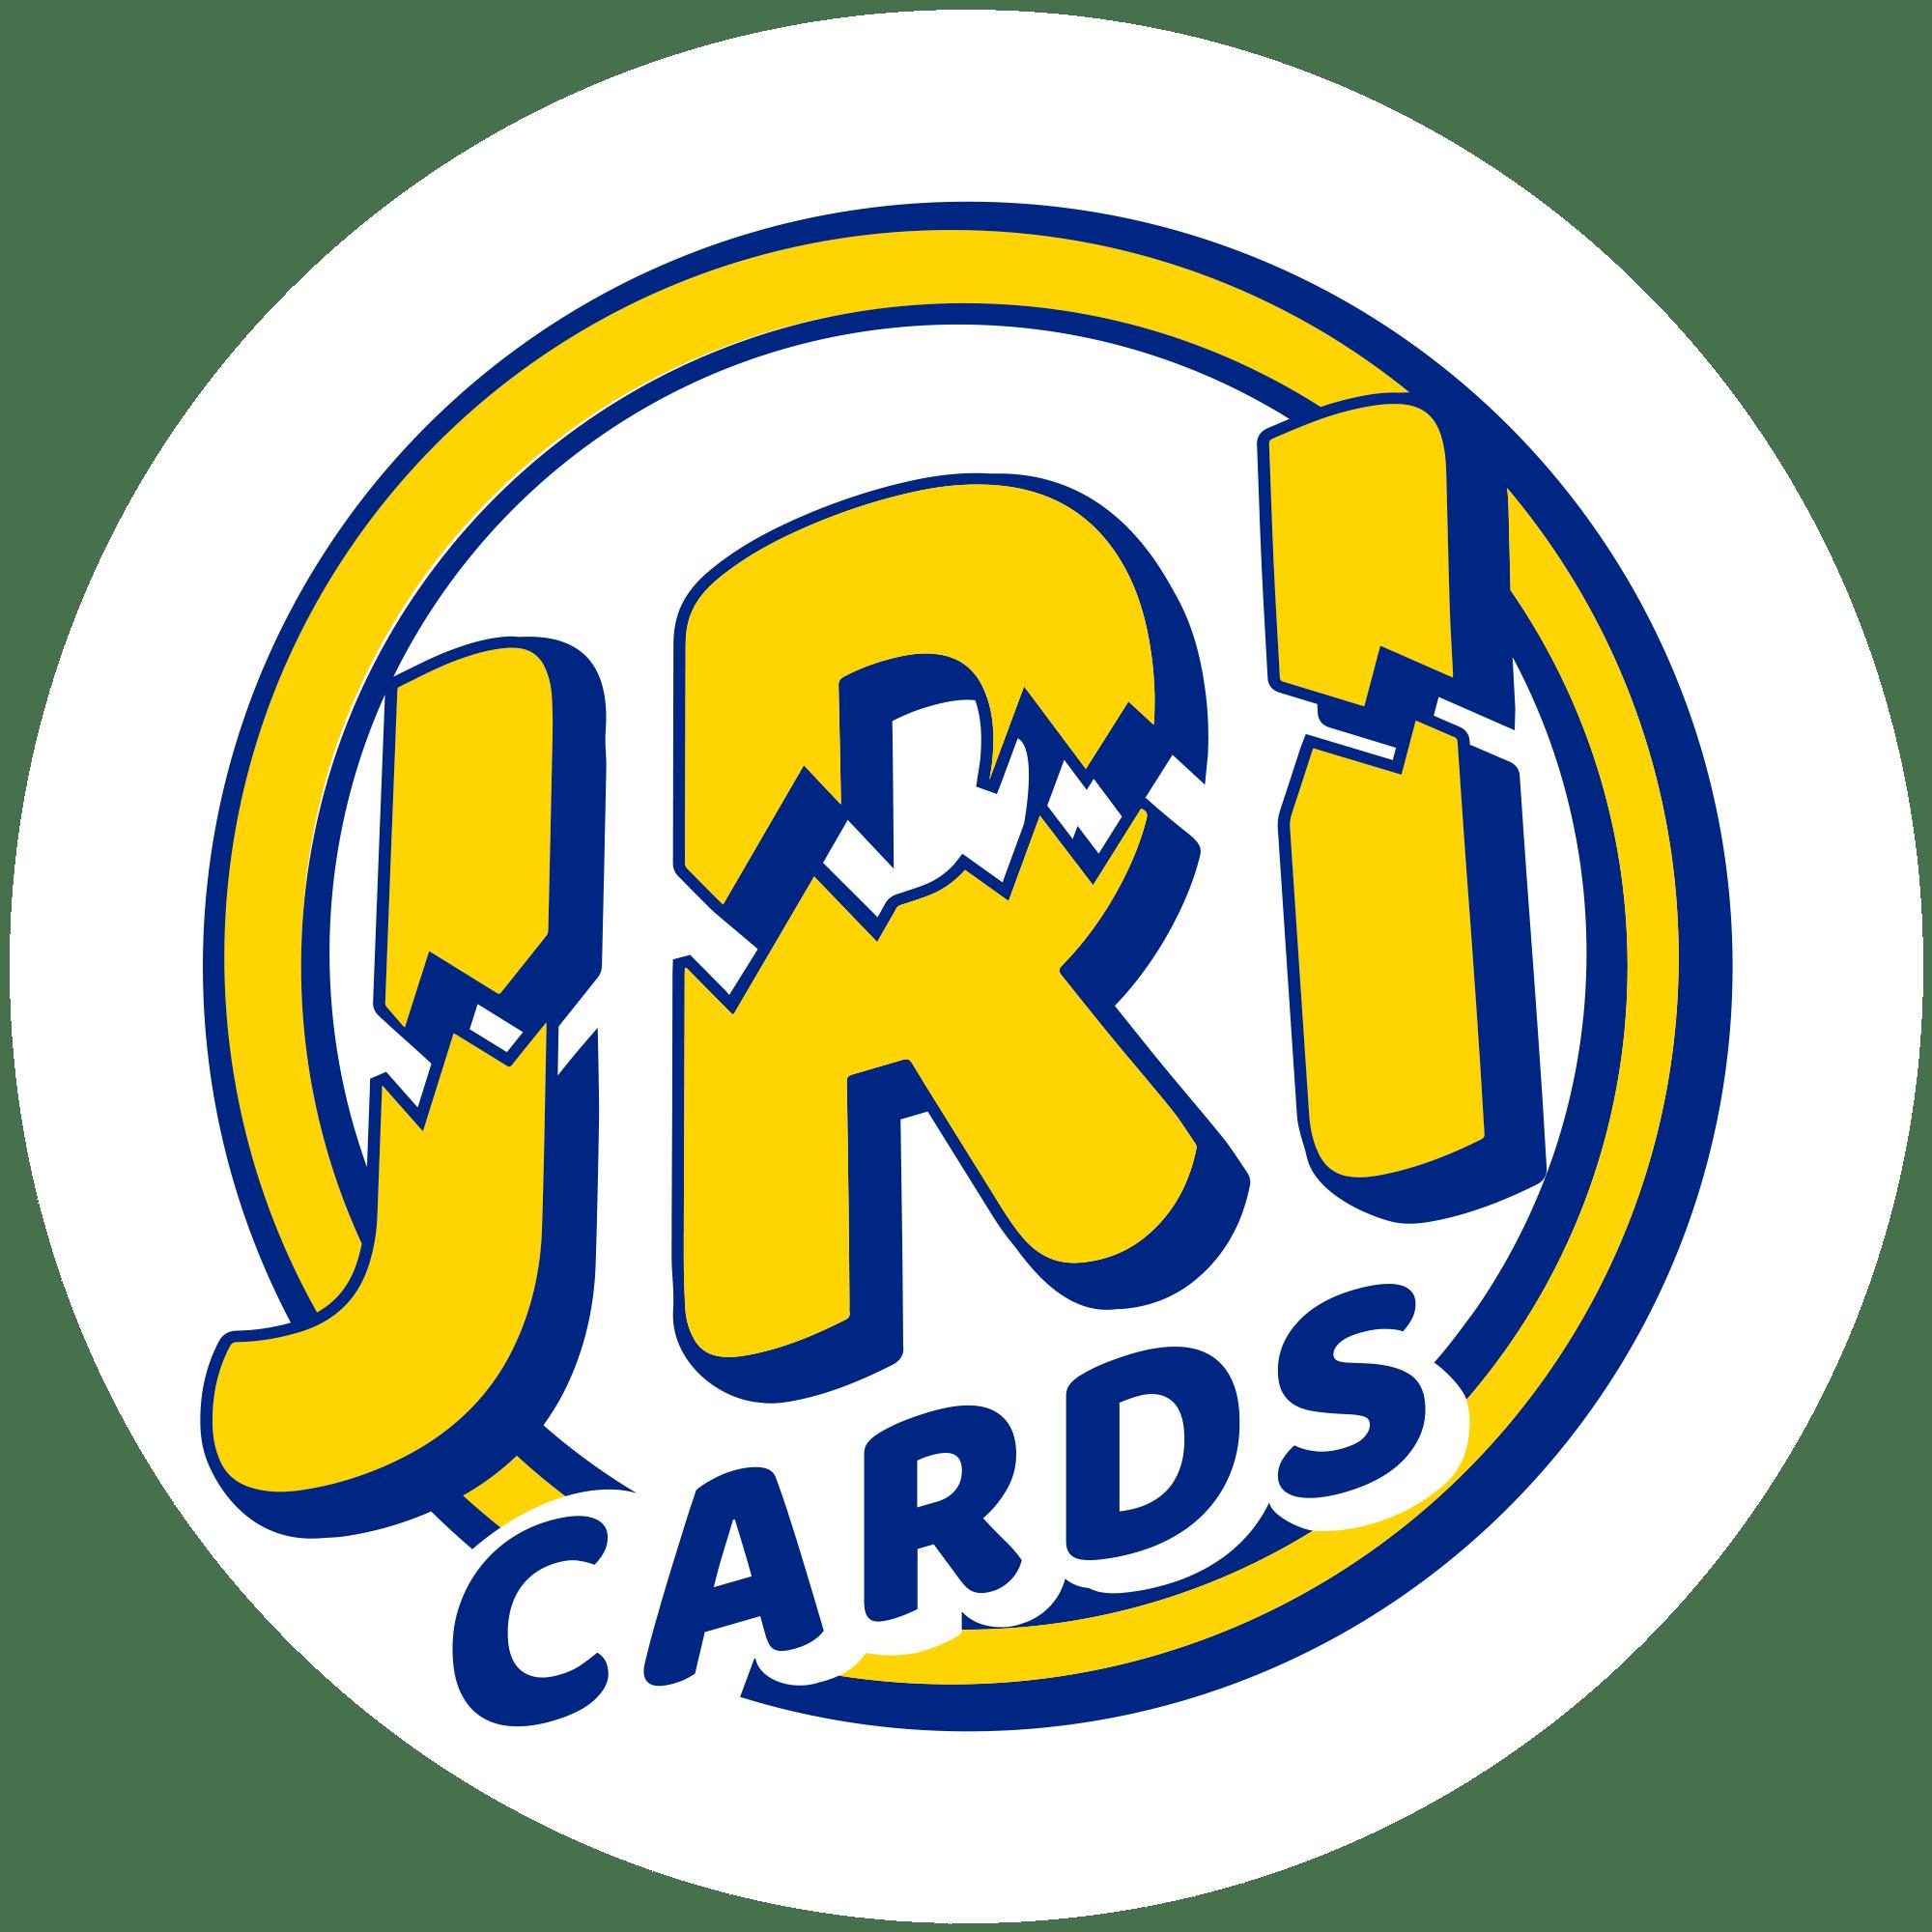 2017 PANINI DONRUSS CERTIFIED CUTS FOOTBALL HOBBY BOX (12 PACKS AVAILABLE)